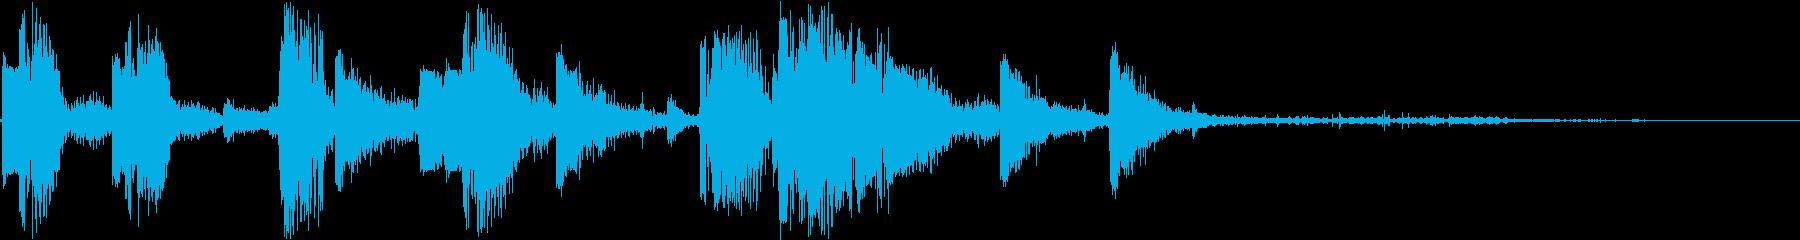 DJ効果音 ハイタッチの再生済みの波形